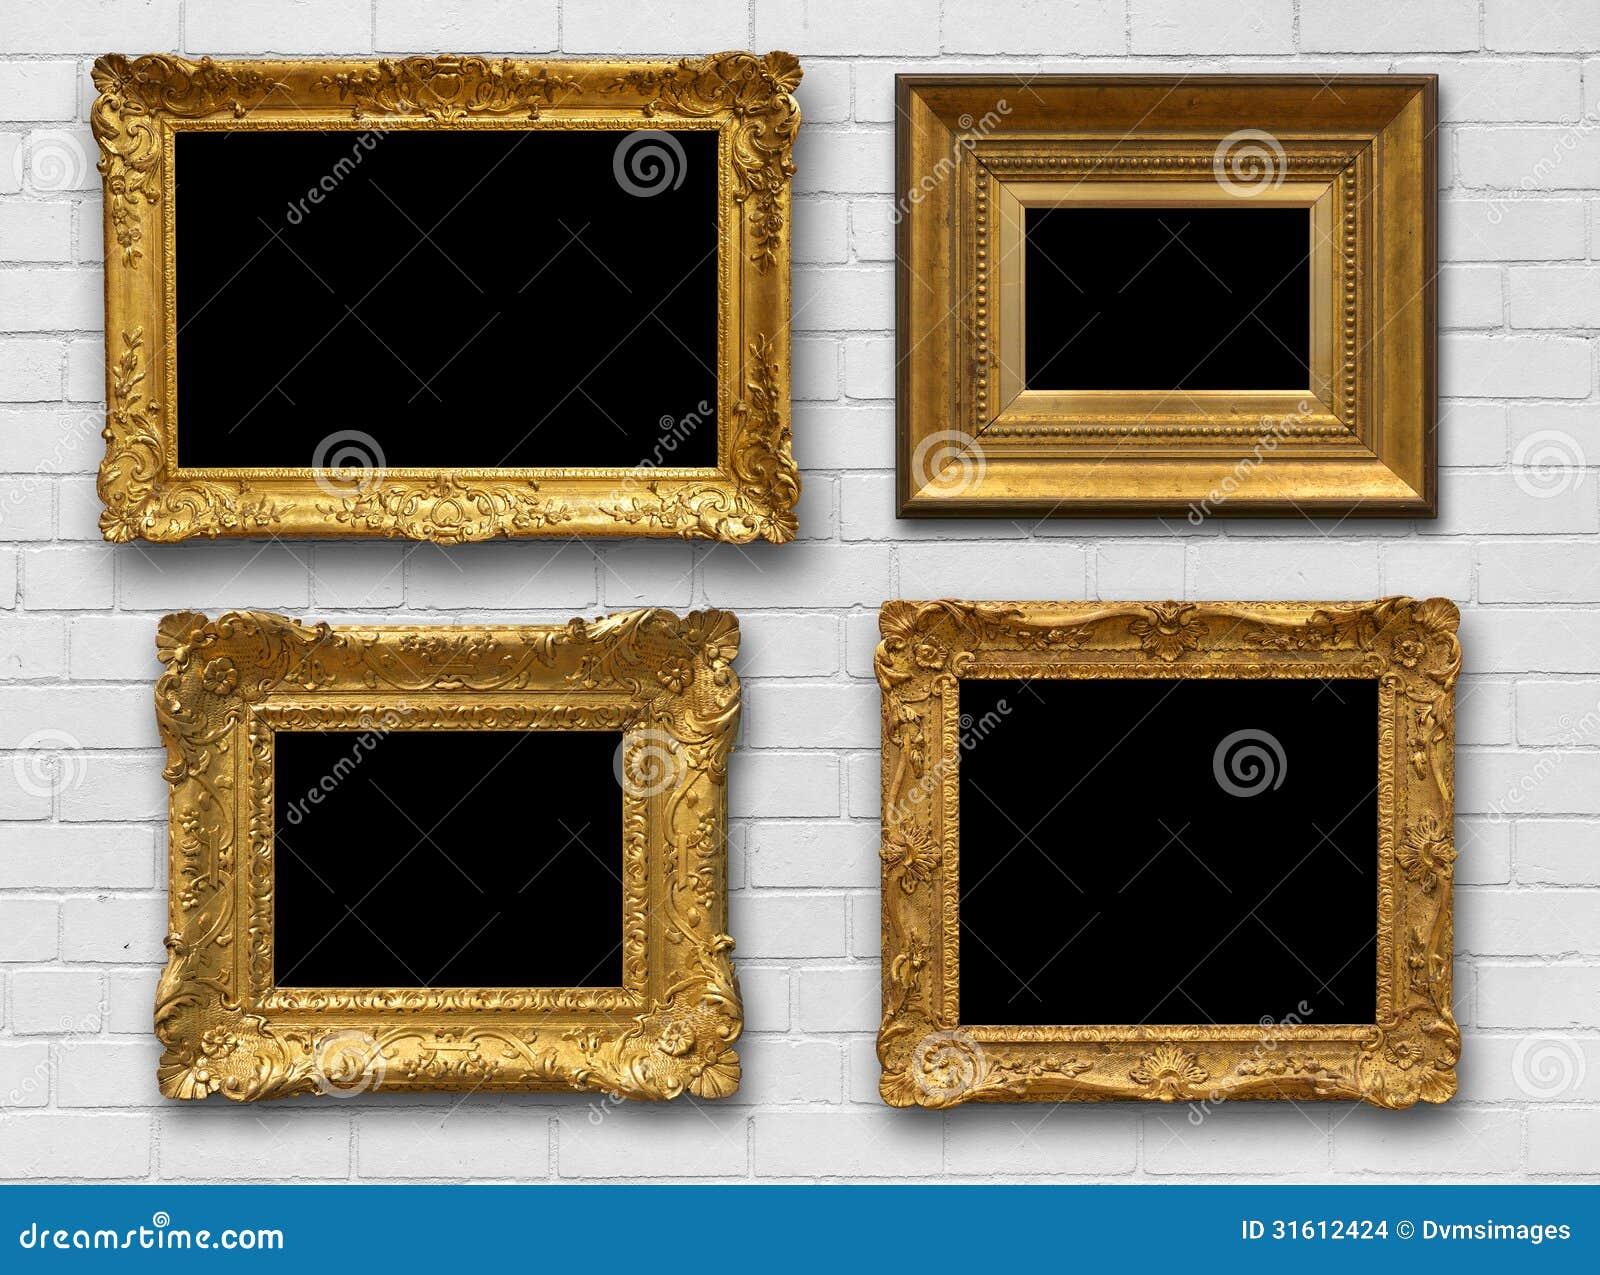 Bakstenen Muur Tuin : Gold Frames On Brick Wall